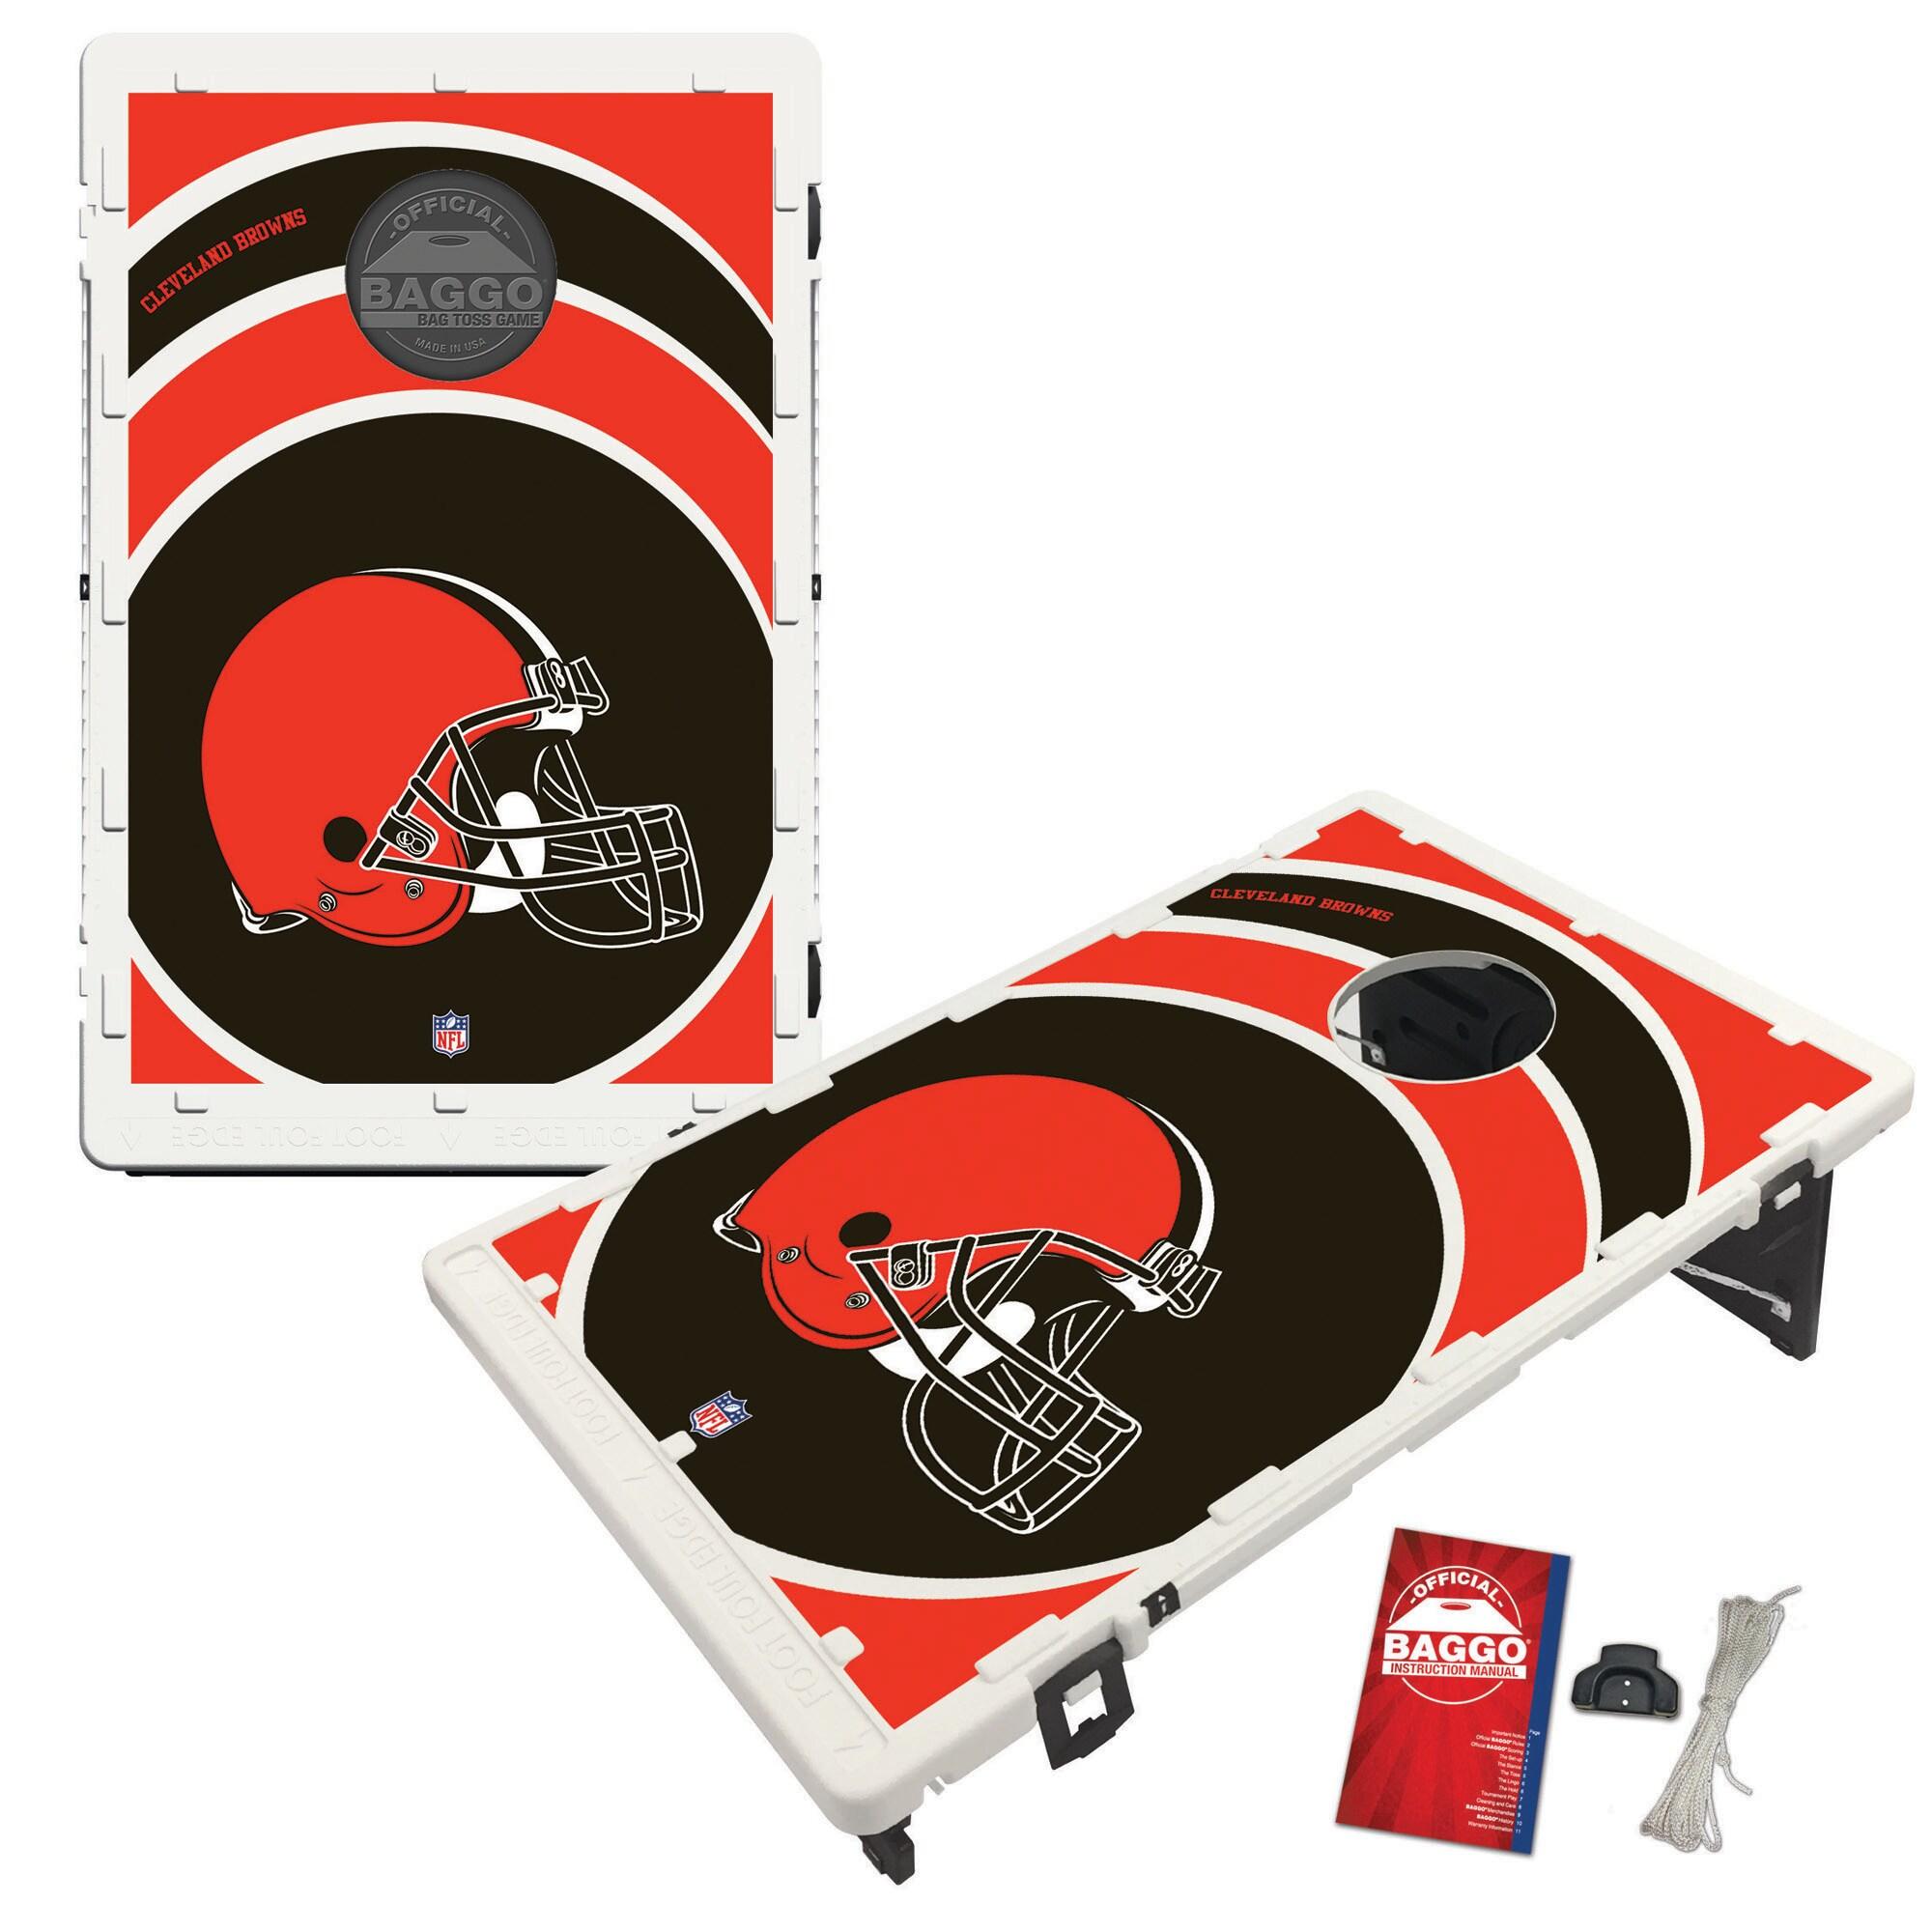 Cleveland Browns 2' x 3' BAGGO Vortex Cornhole Board Tailgate Toss Set